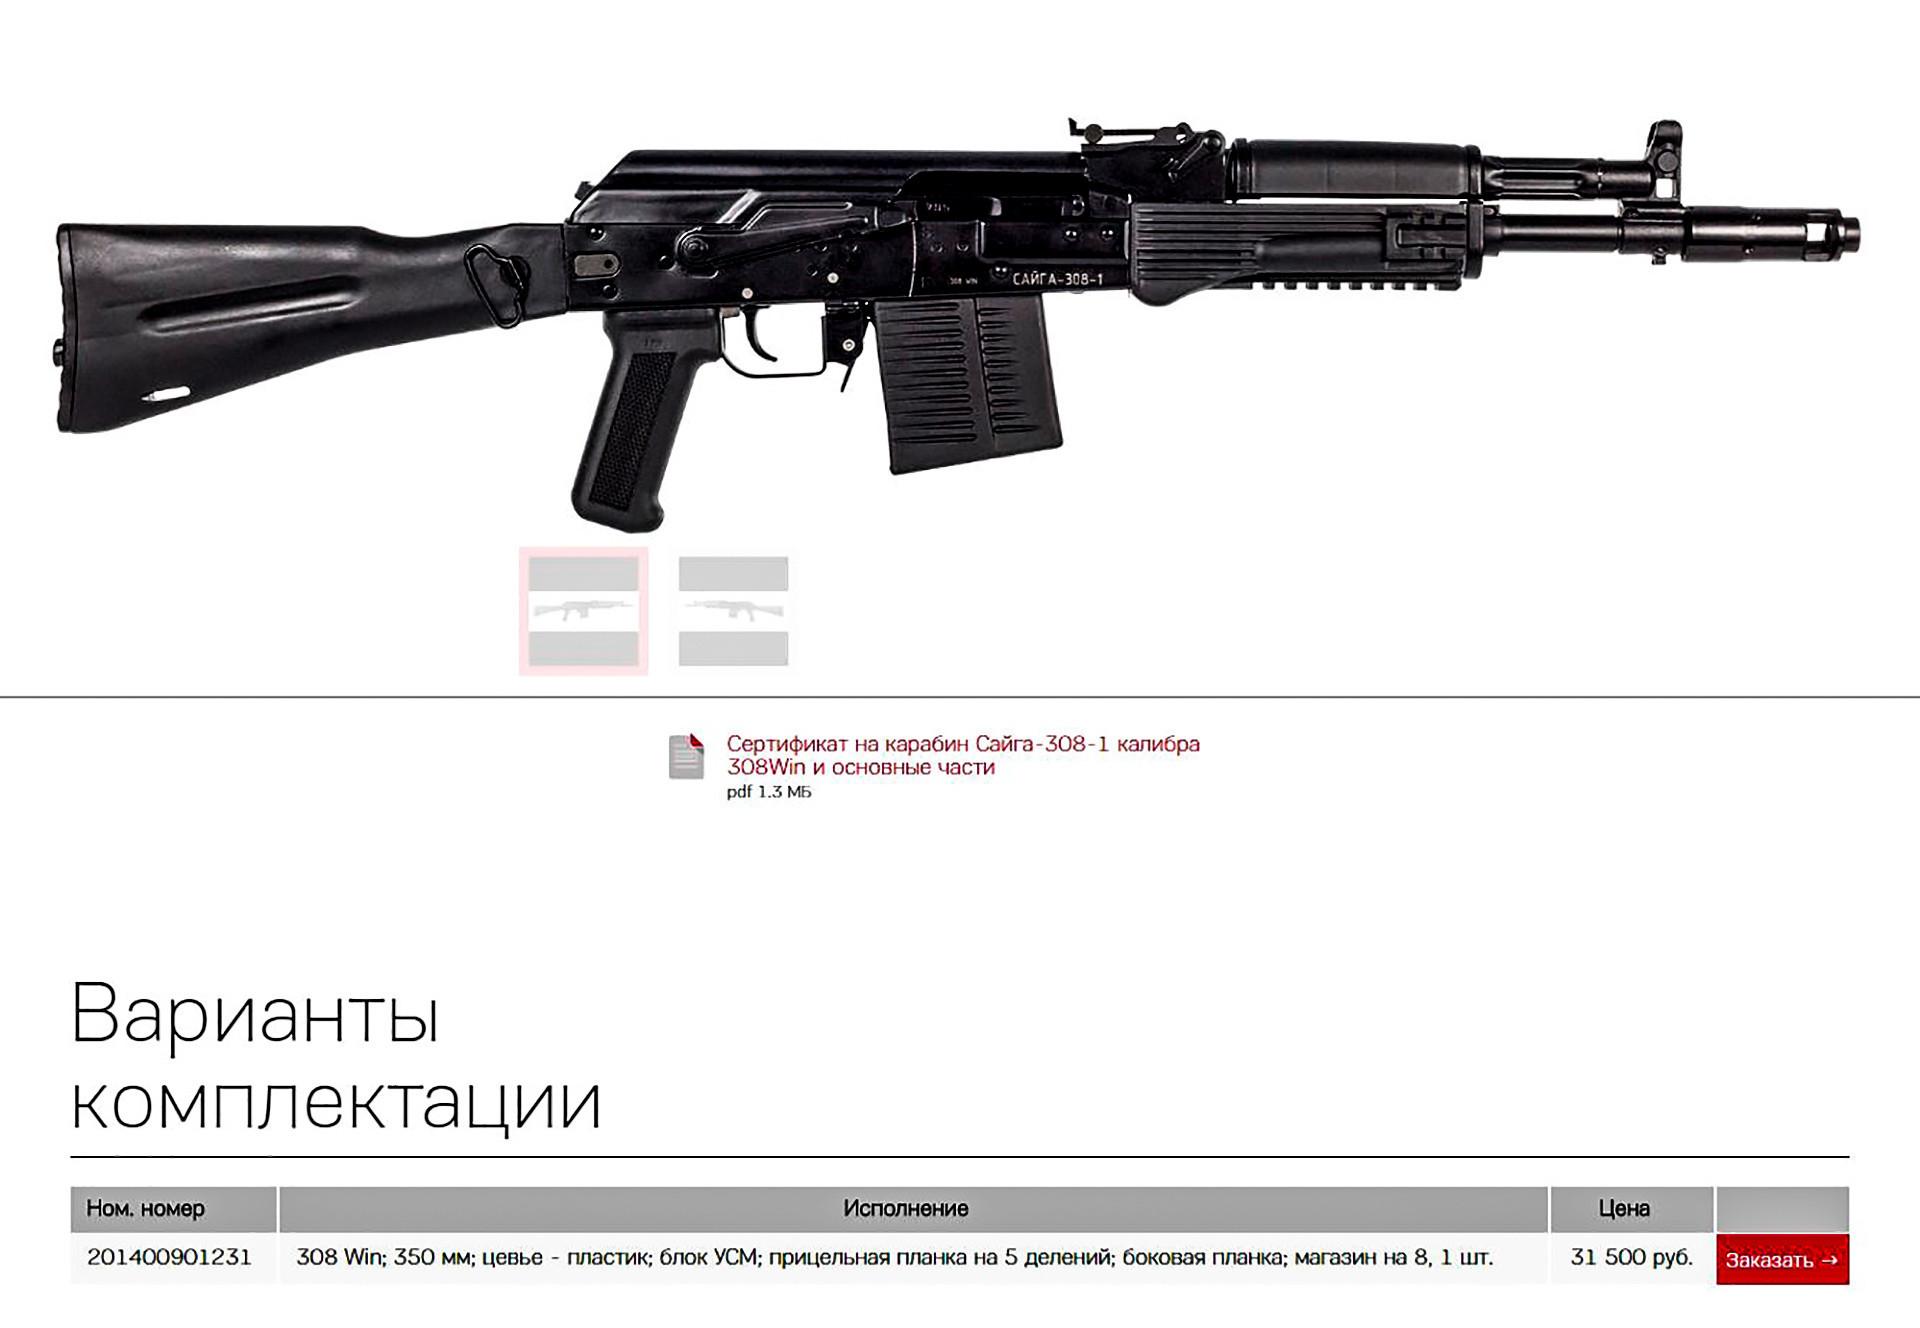 Saiga 308-1 version 46